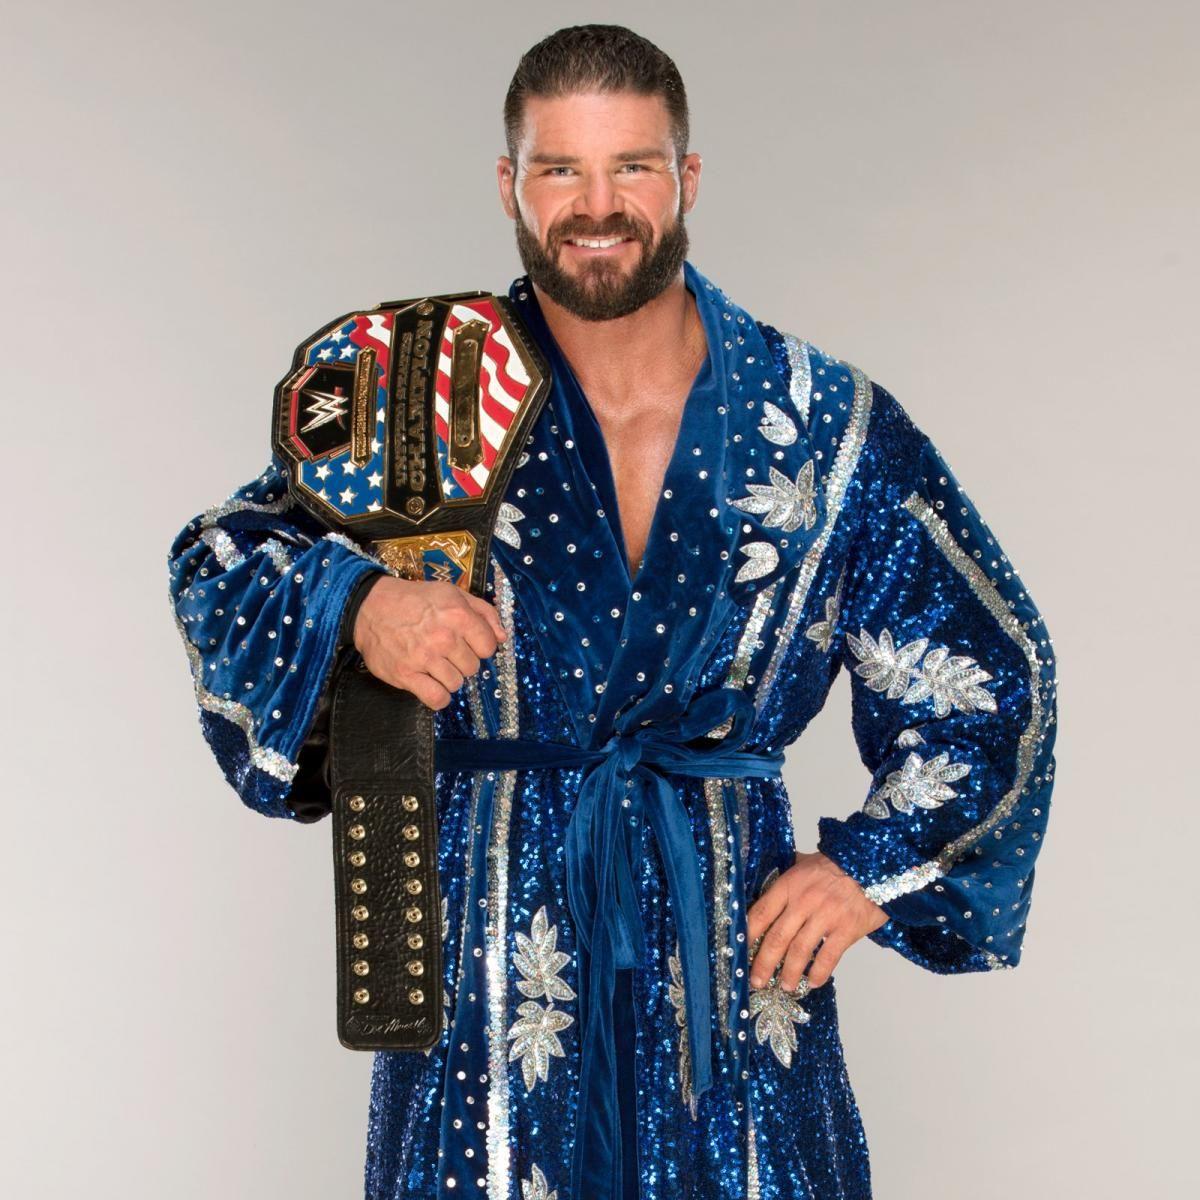 Bobby Lashley Returns To The Hall Of U S Champions John Cena Wwe Champion Wwf Superstars Wrestling Superstars